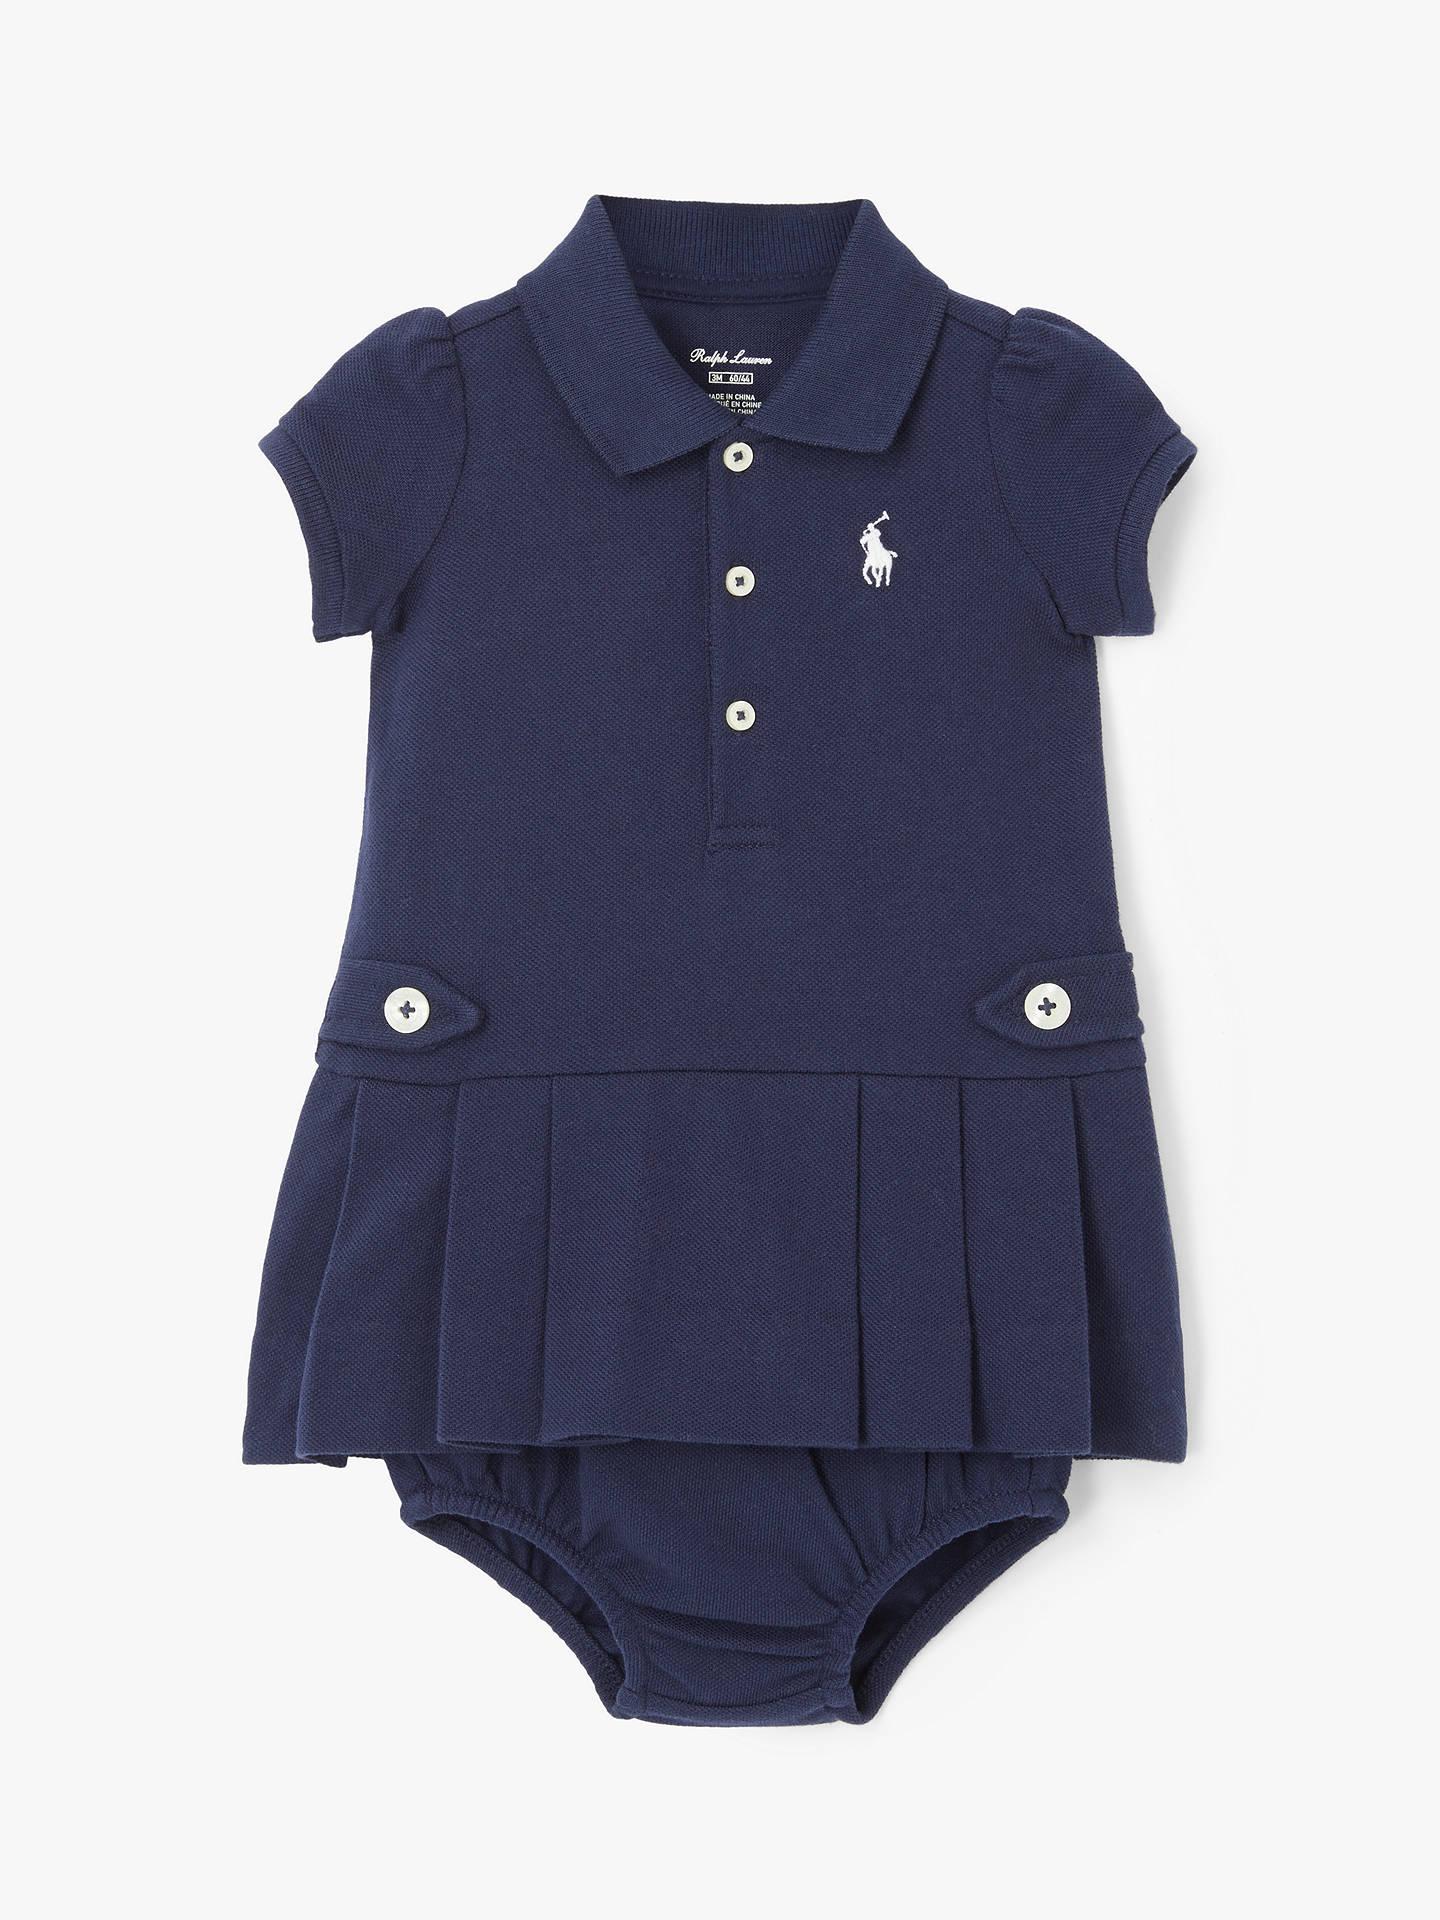 42694698 Polo Ralph Lauren Baby Polo Dress, Navy